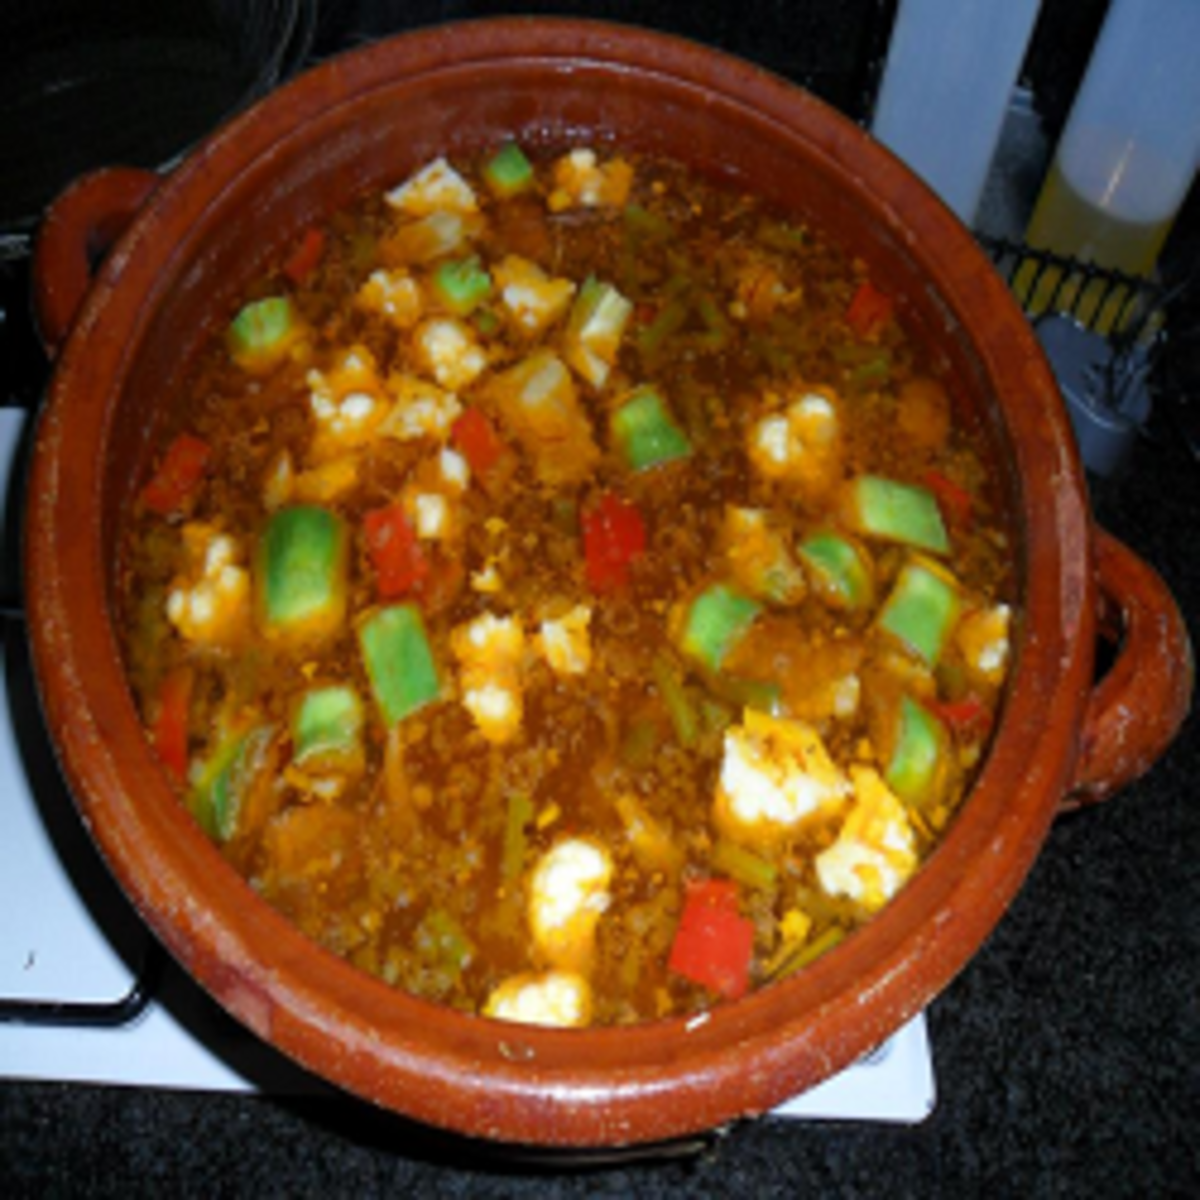 Arroz brut - Dirty rice with setas